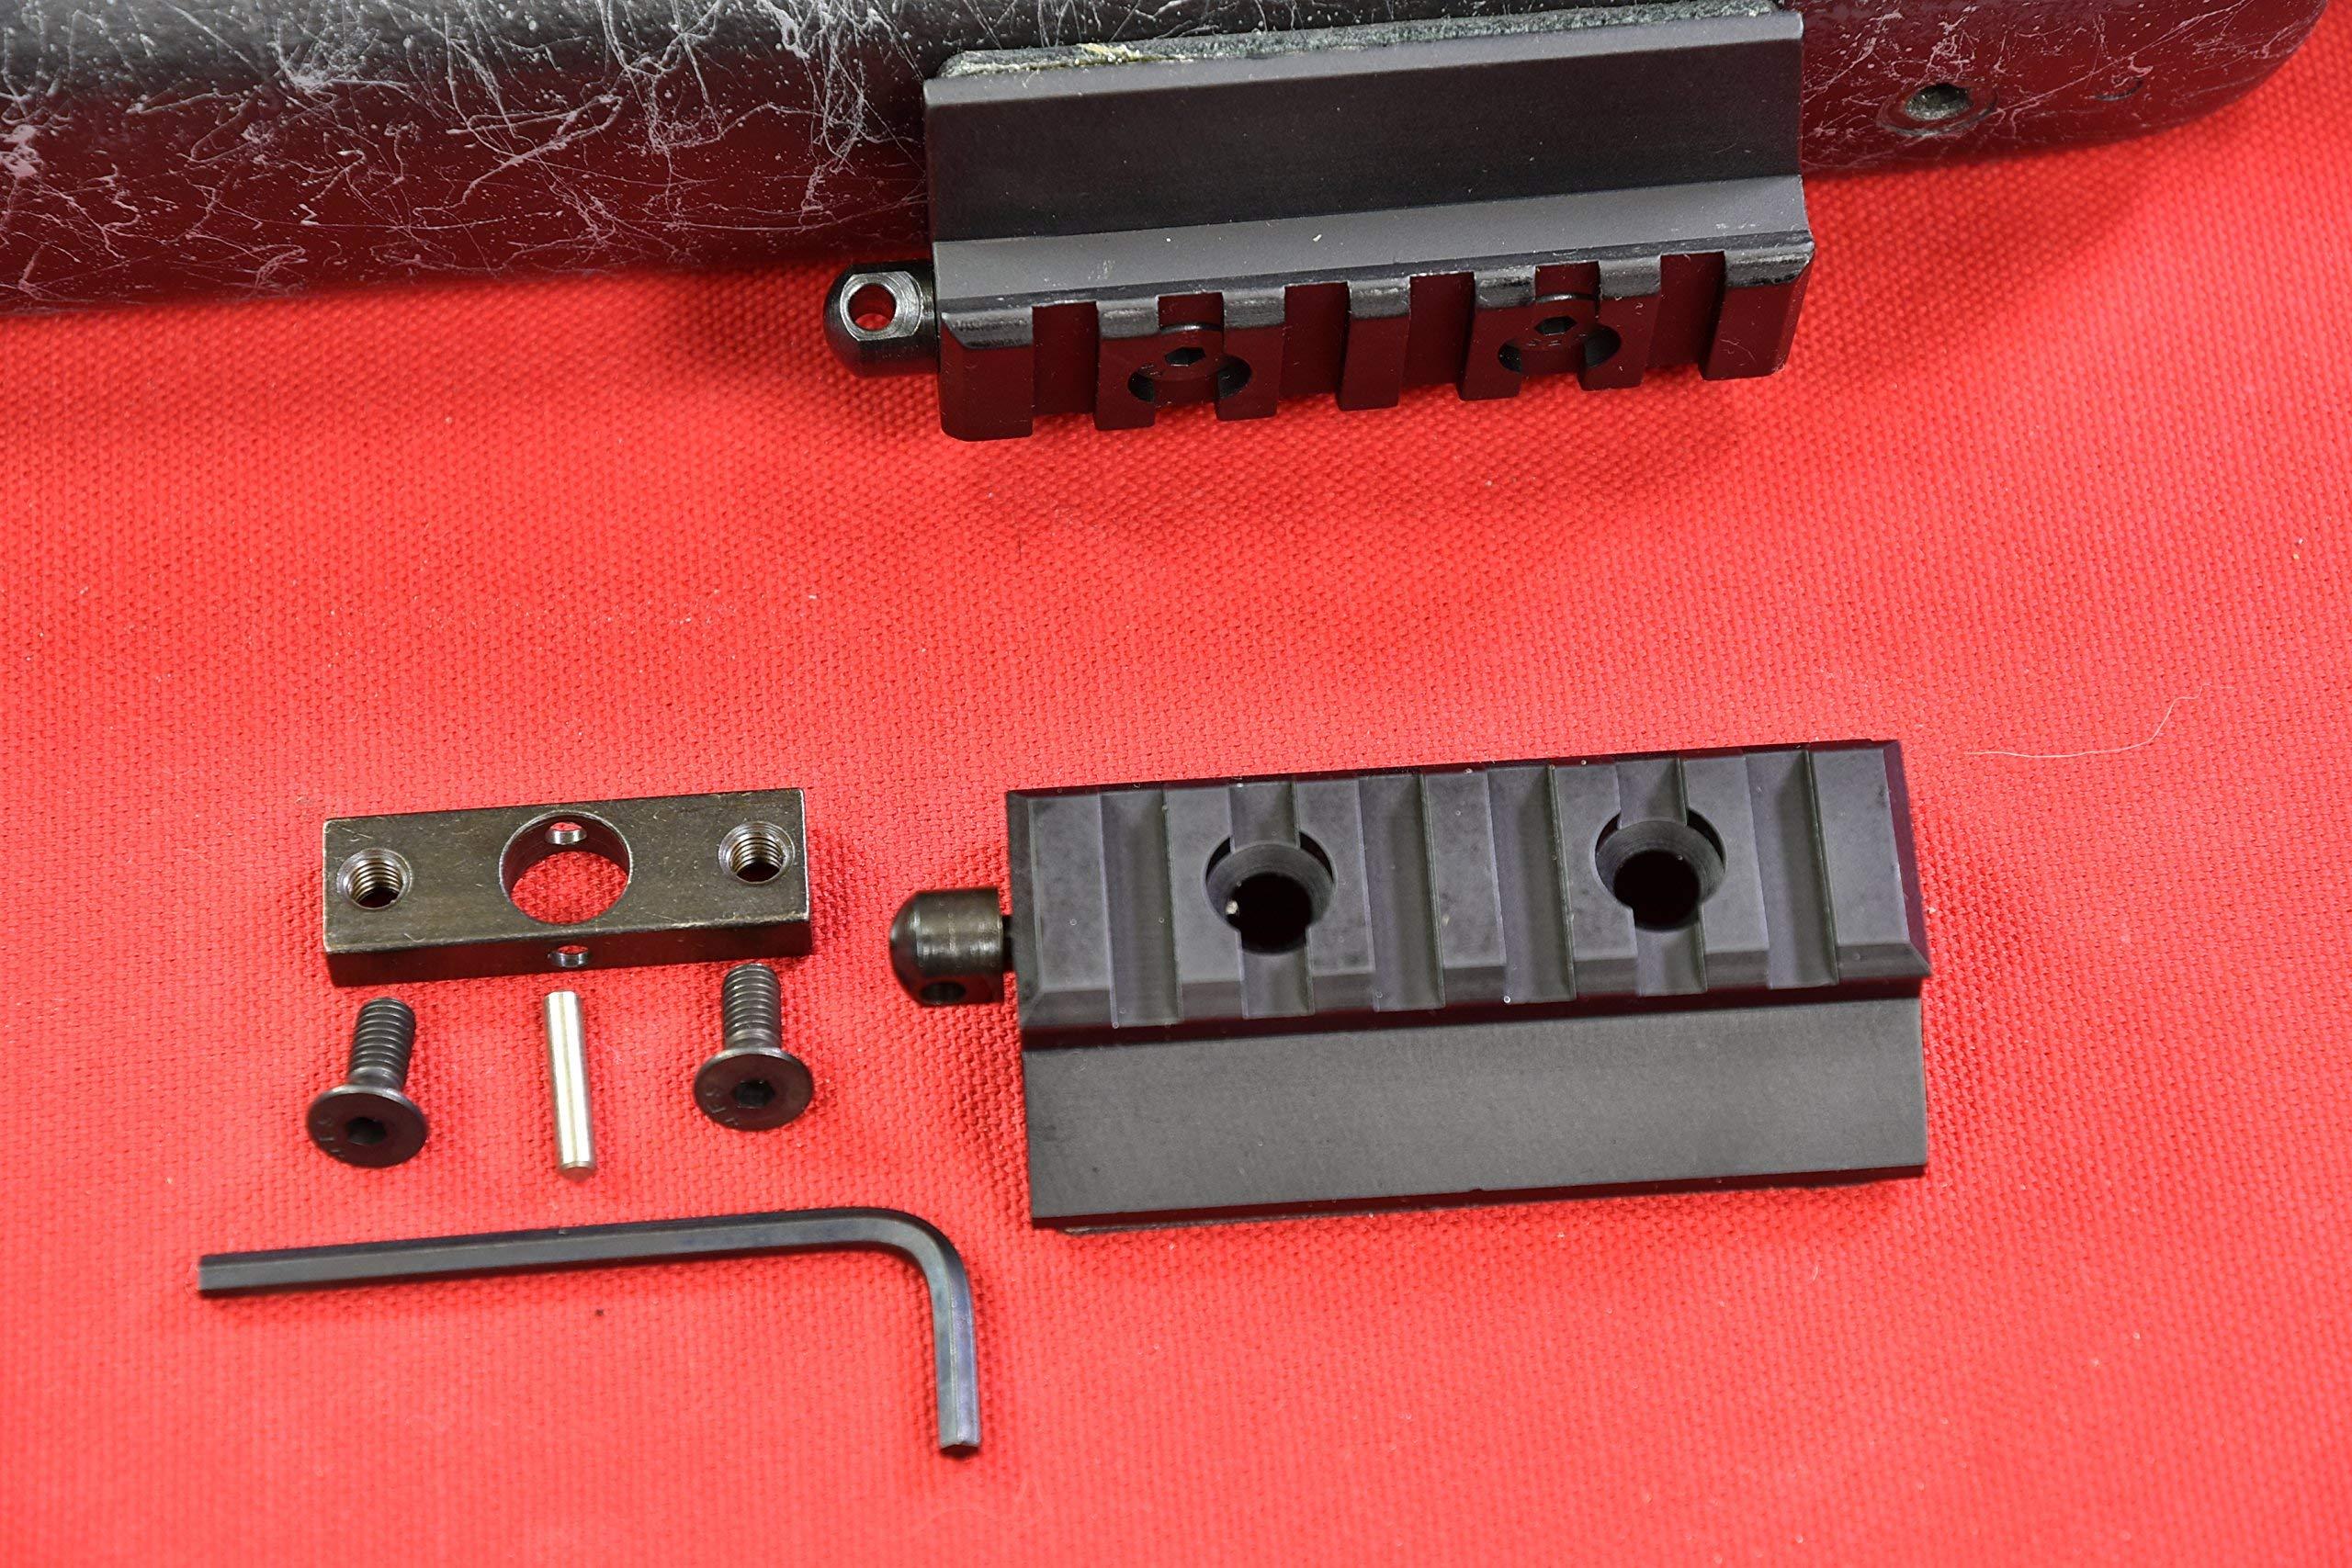 S.R.A. (Swivel Rail Adapter) by MIM Mfg by MIM